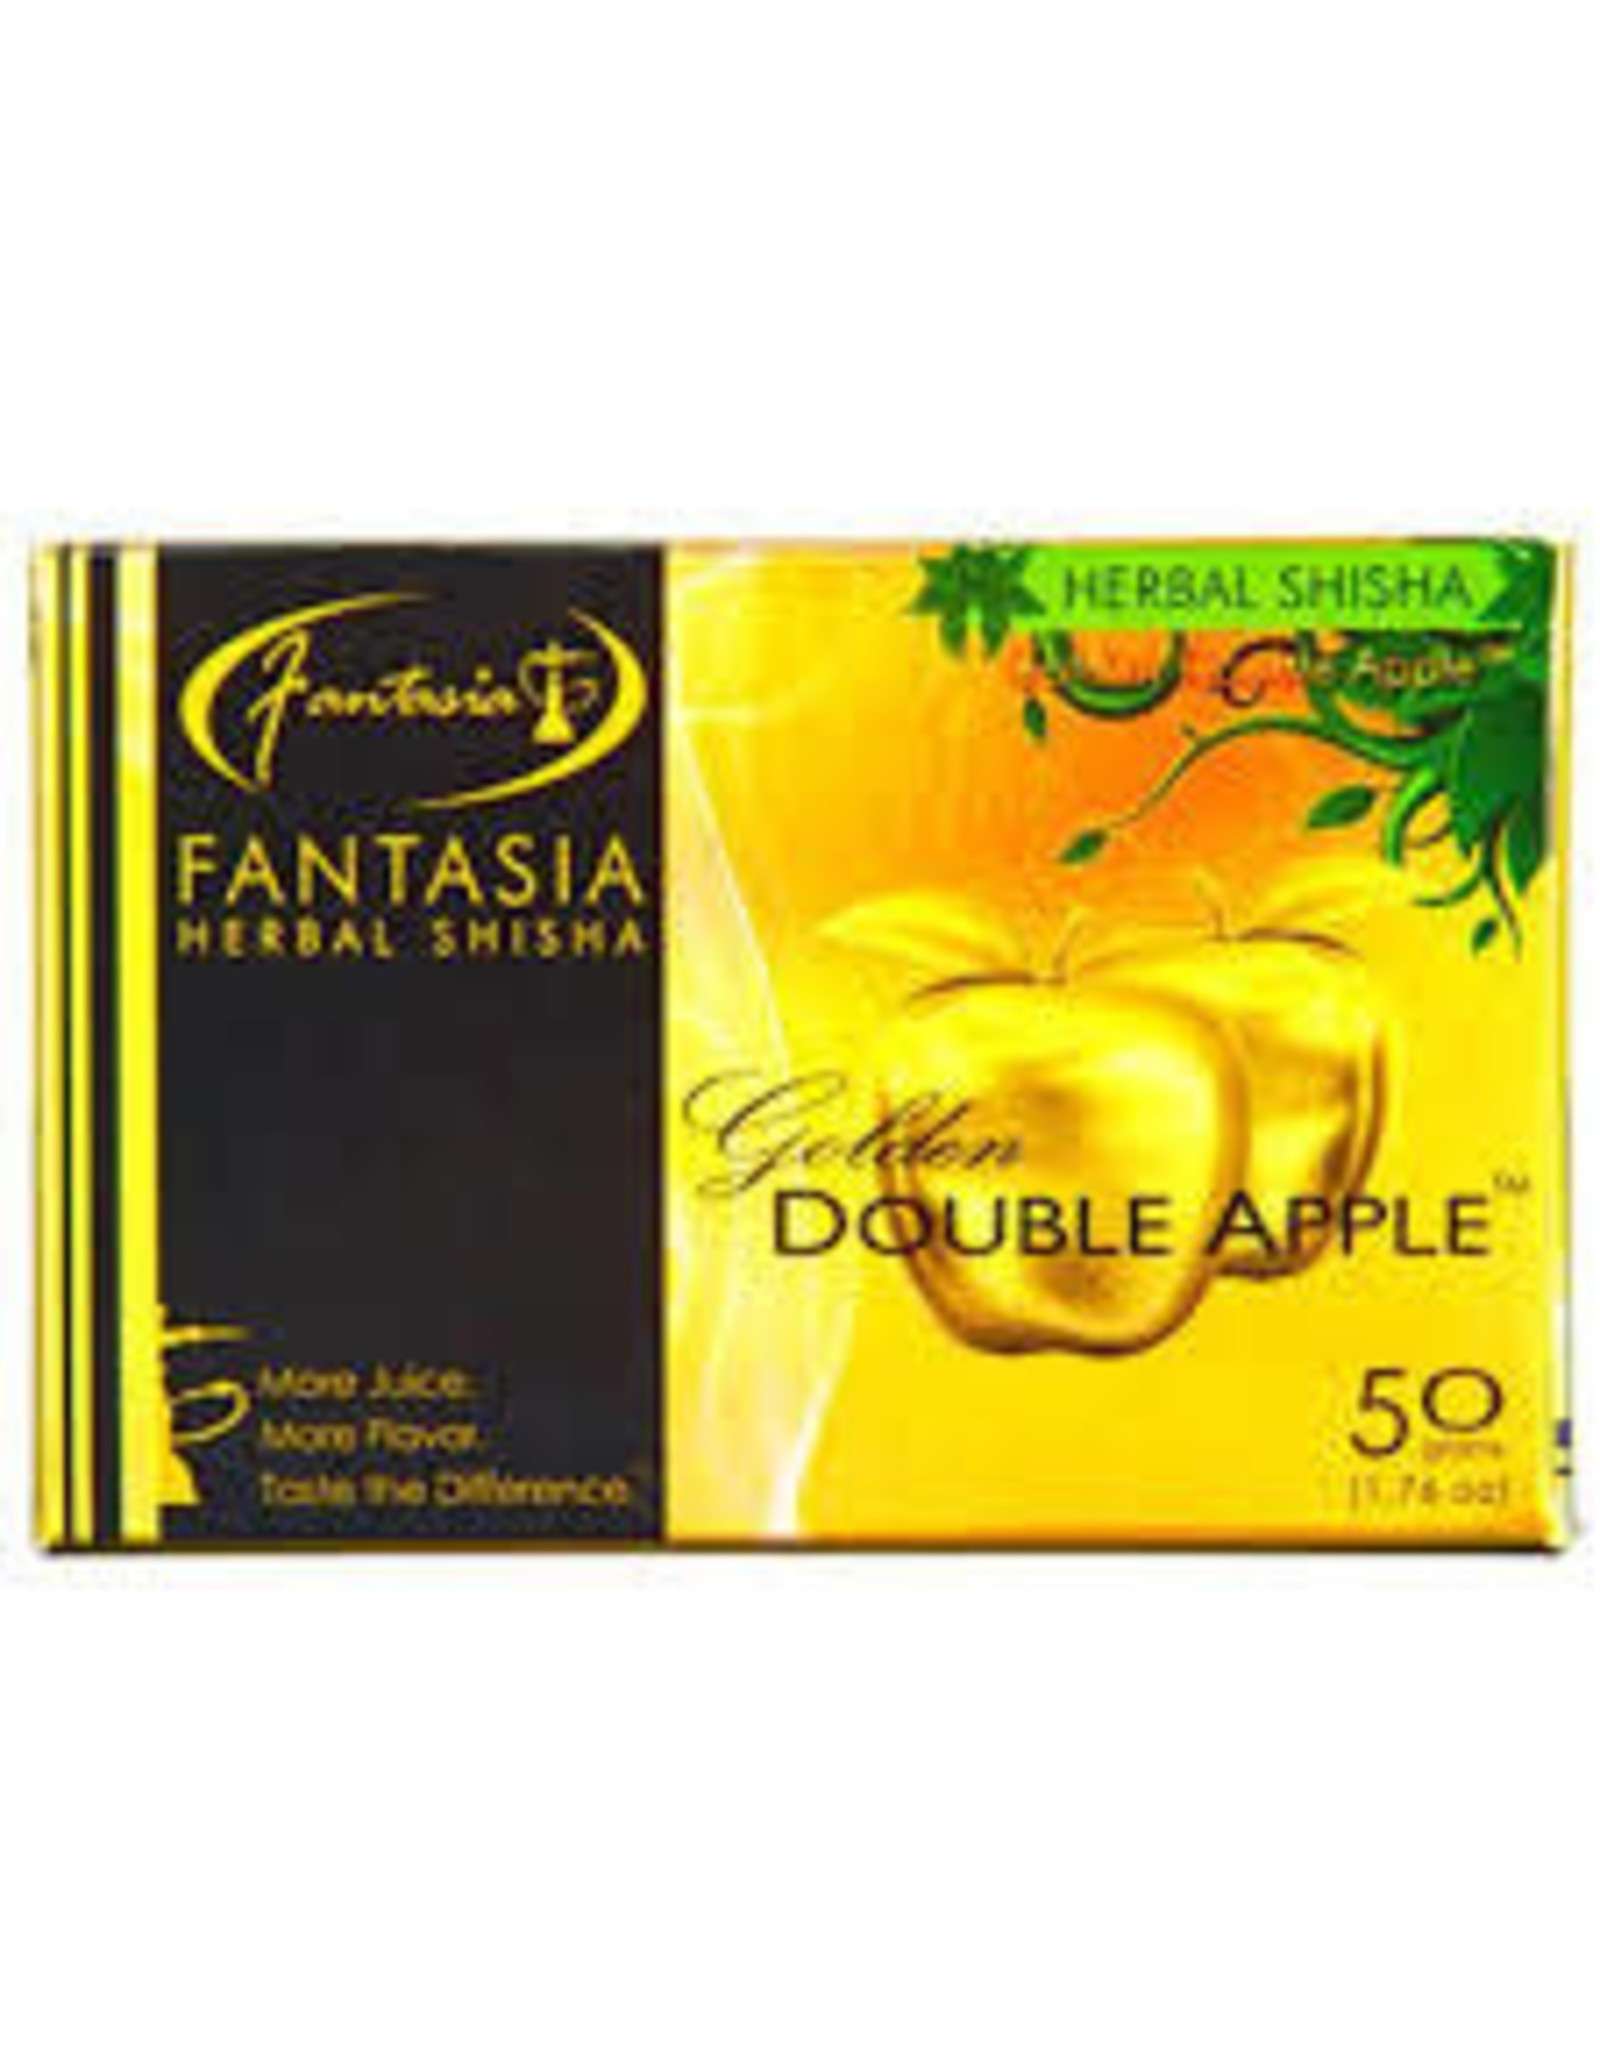 50g Fantasia Herbal Shisha Golden Double Apple